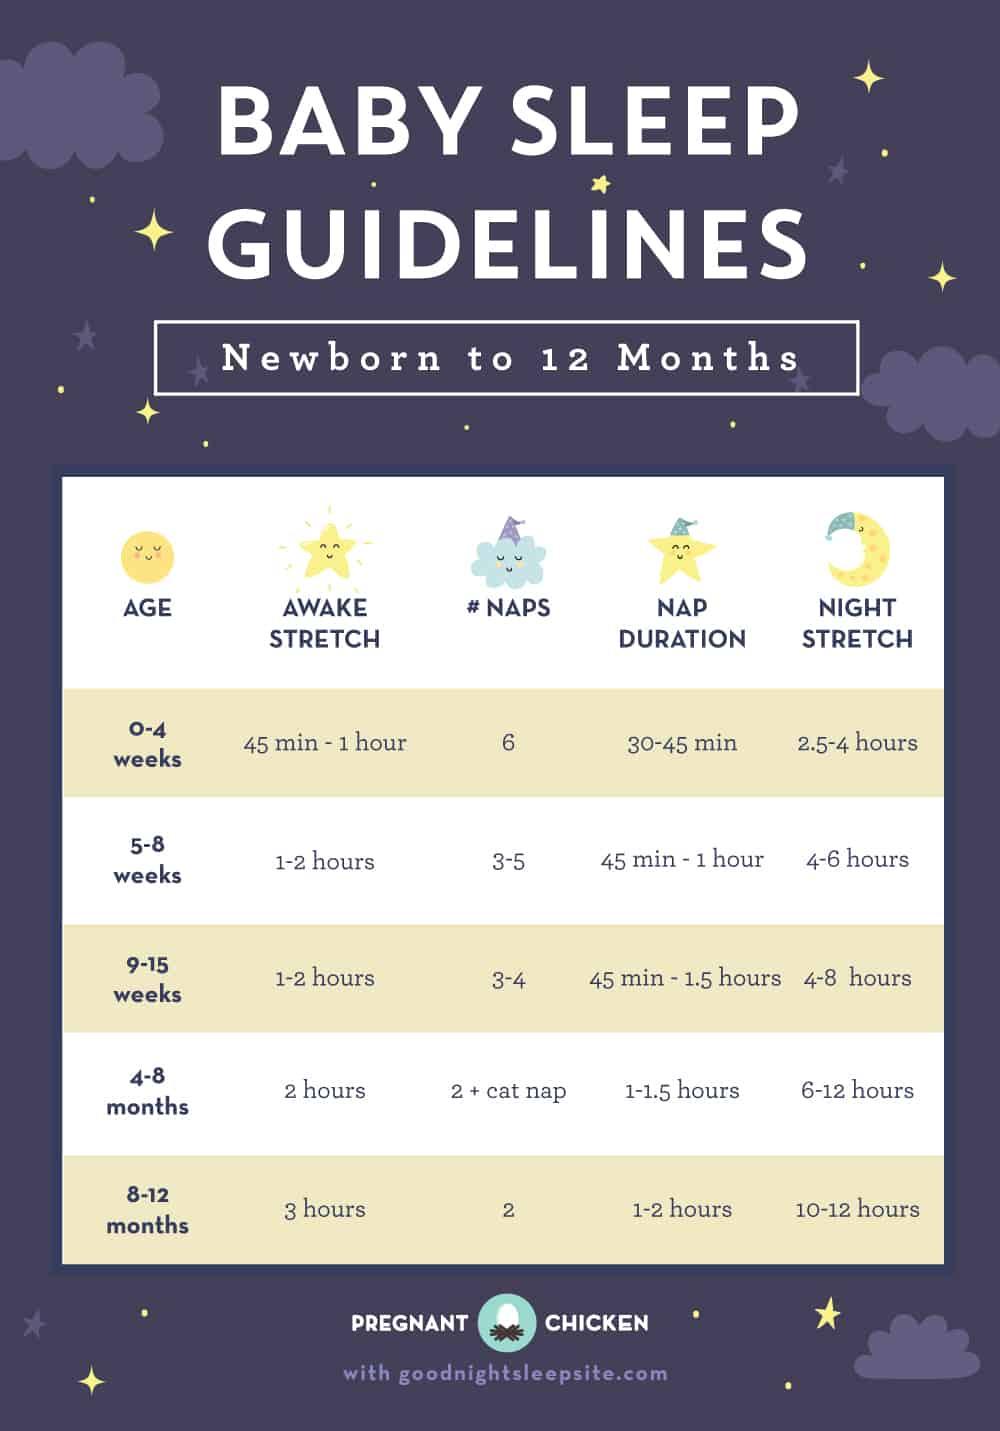 Baby Sleep Guidelines chart – Newborn to 12 Months